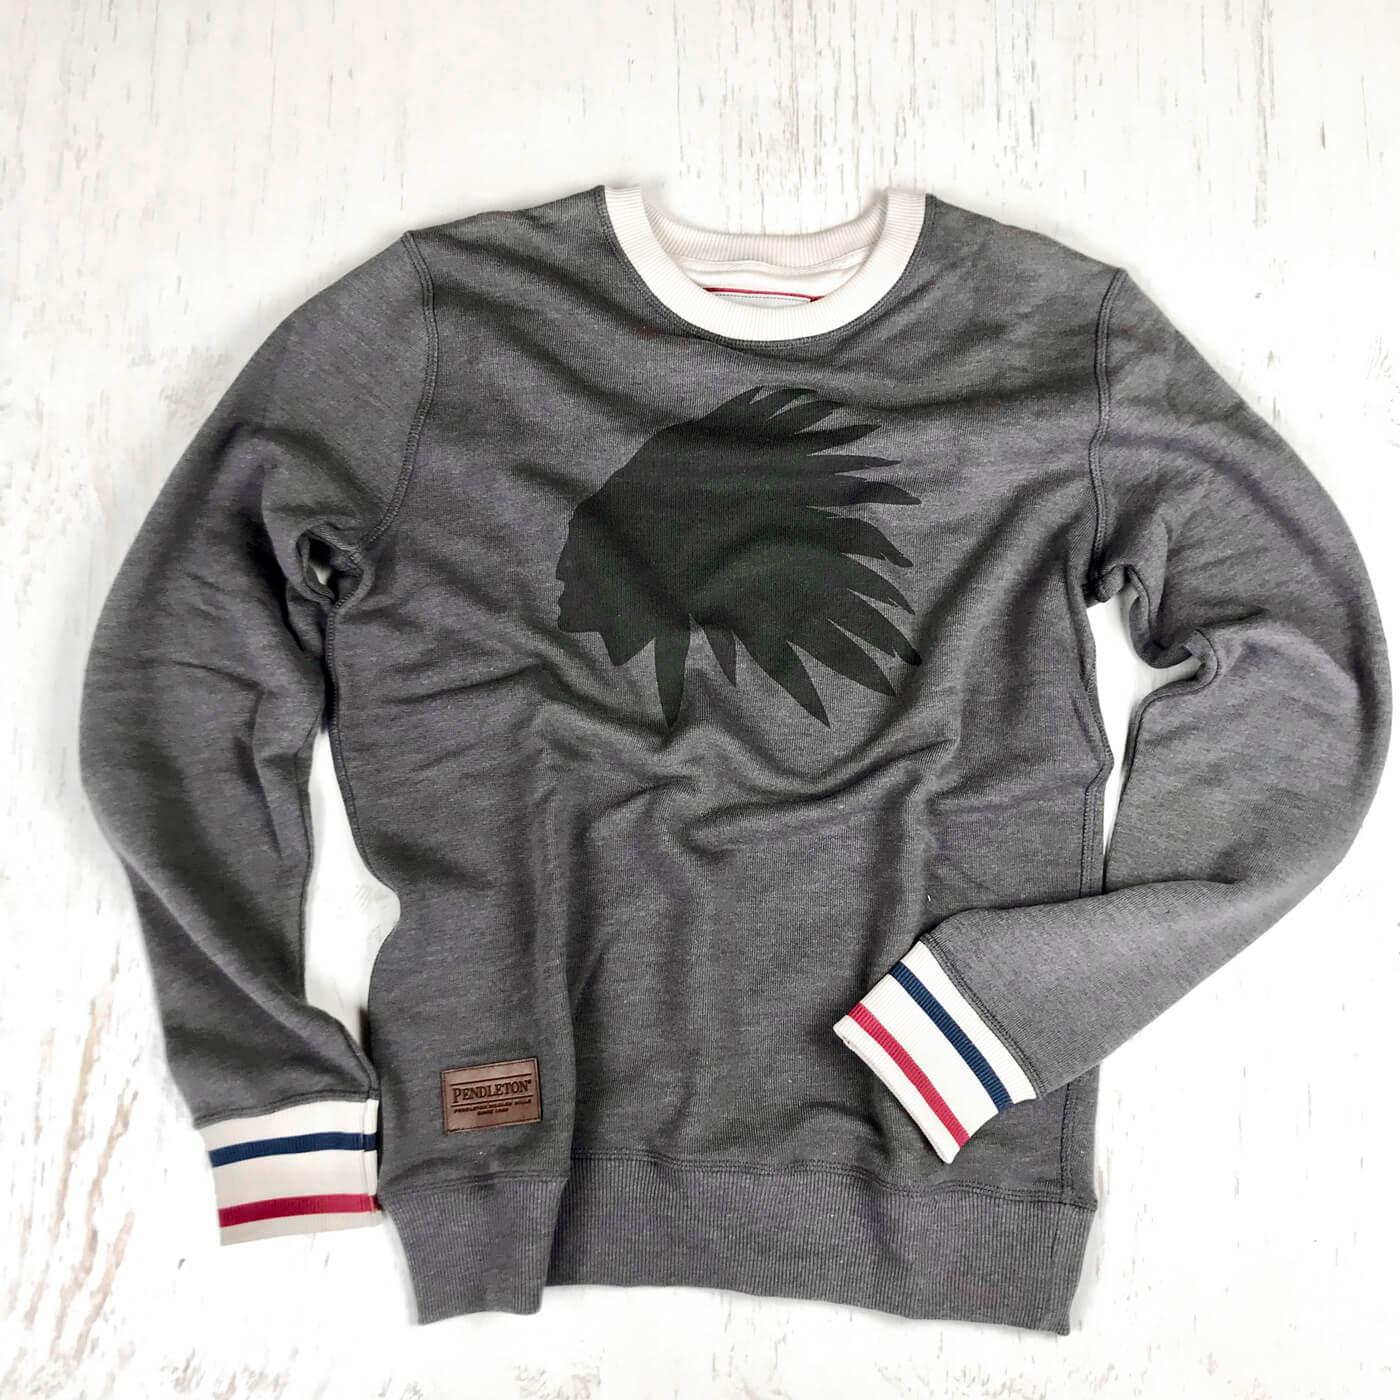 Vintage_Pendleton_Sweater1-1400